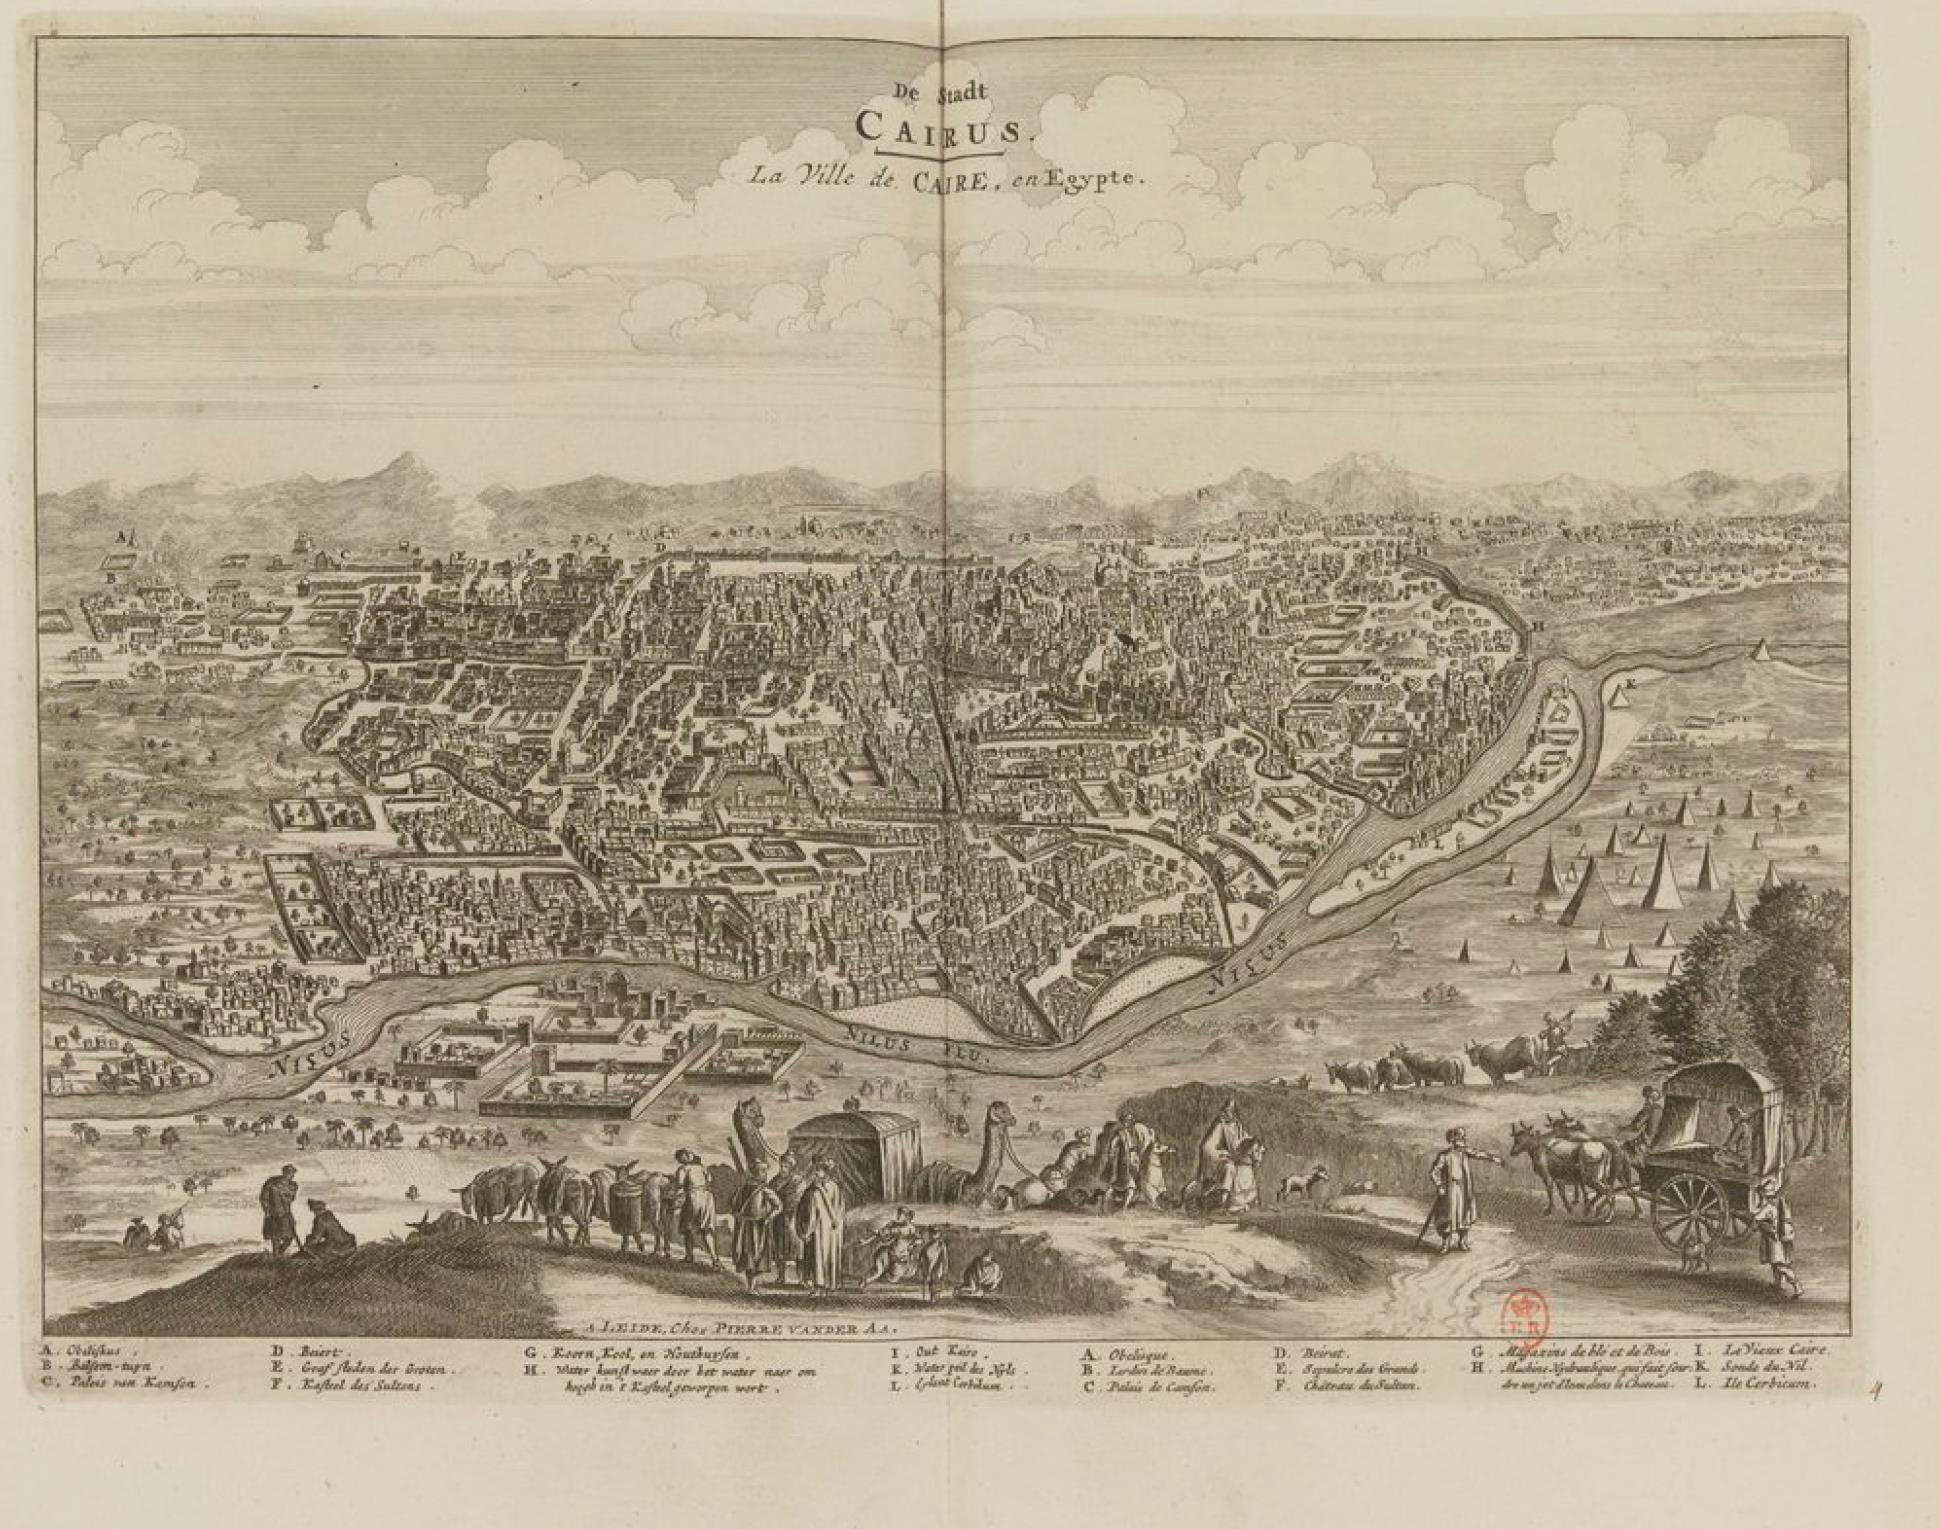 05. Карта Каира